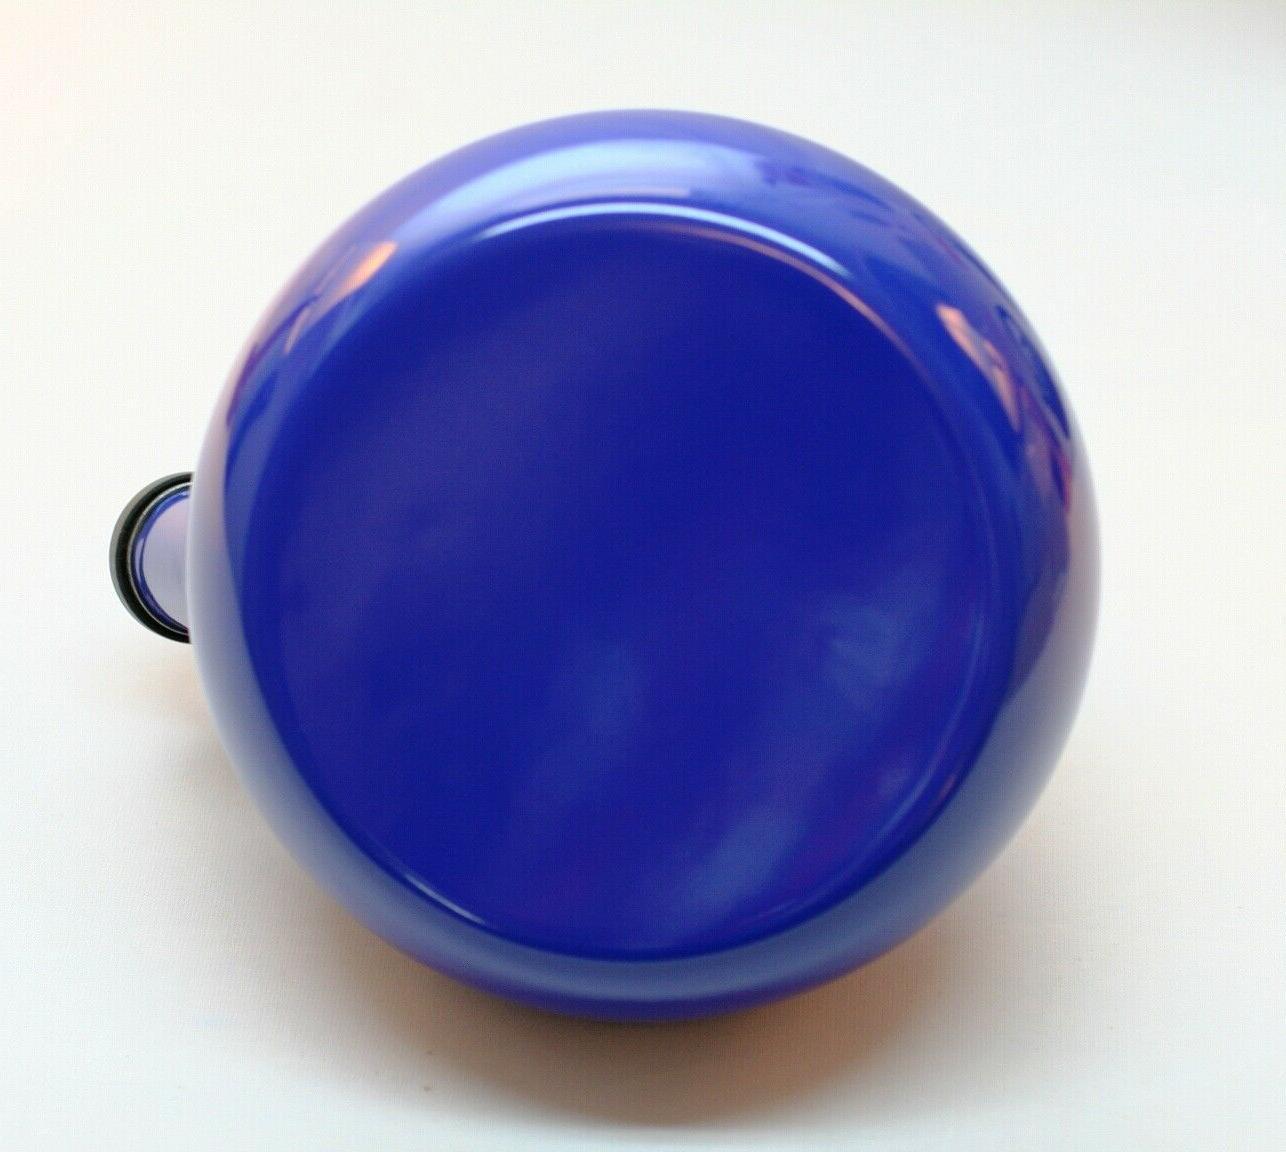 Circulon Tea 1.5 QT Holds Cups, Stain-Resistant Exterior